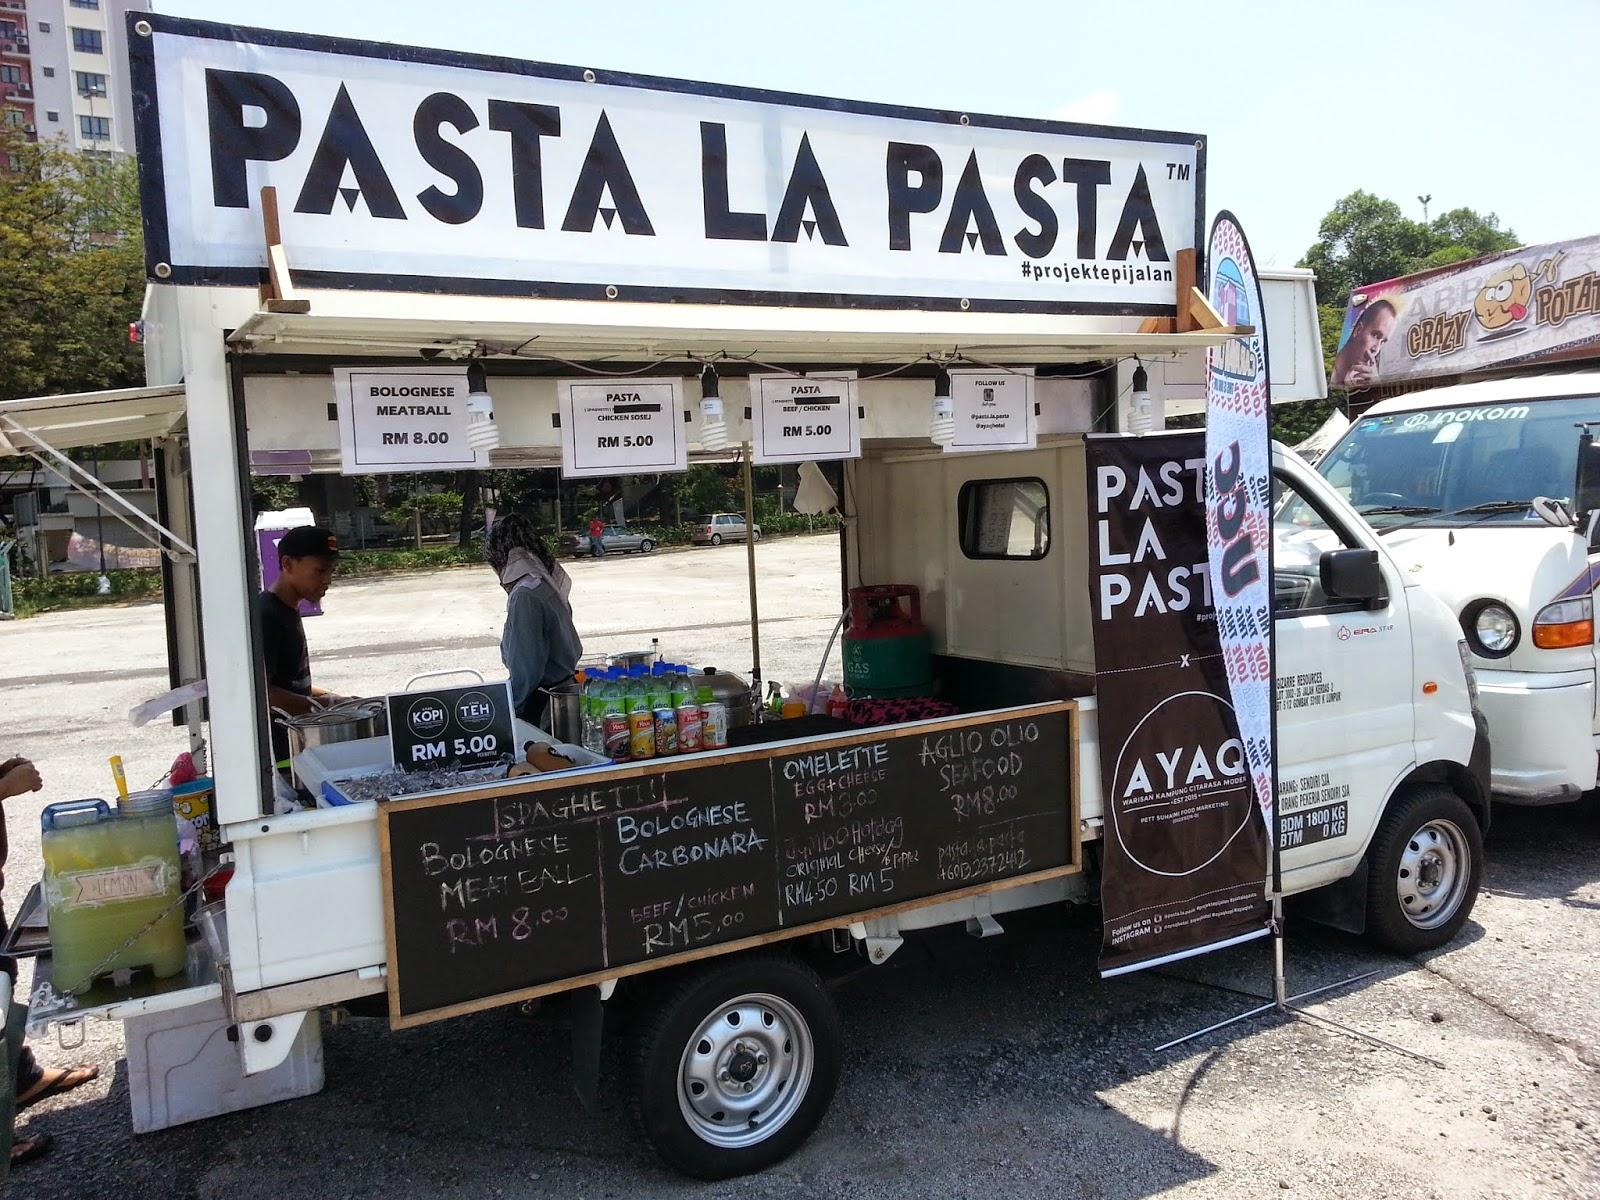 That S My Pasta Food Truck Menu